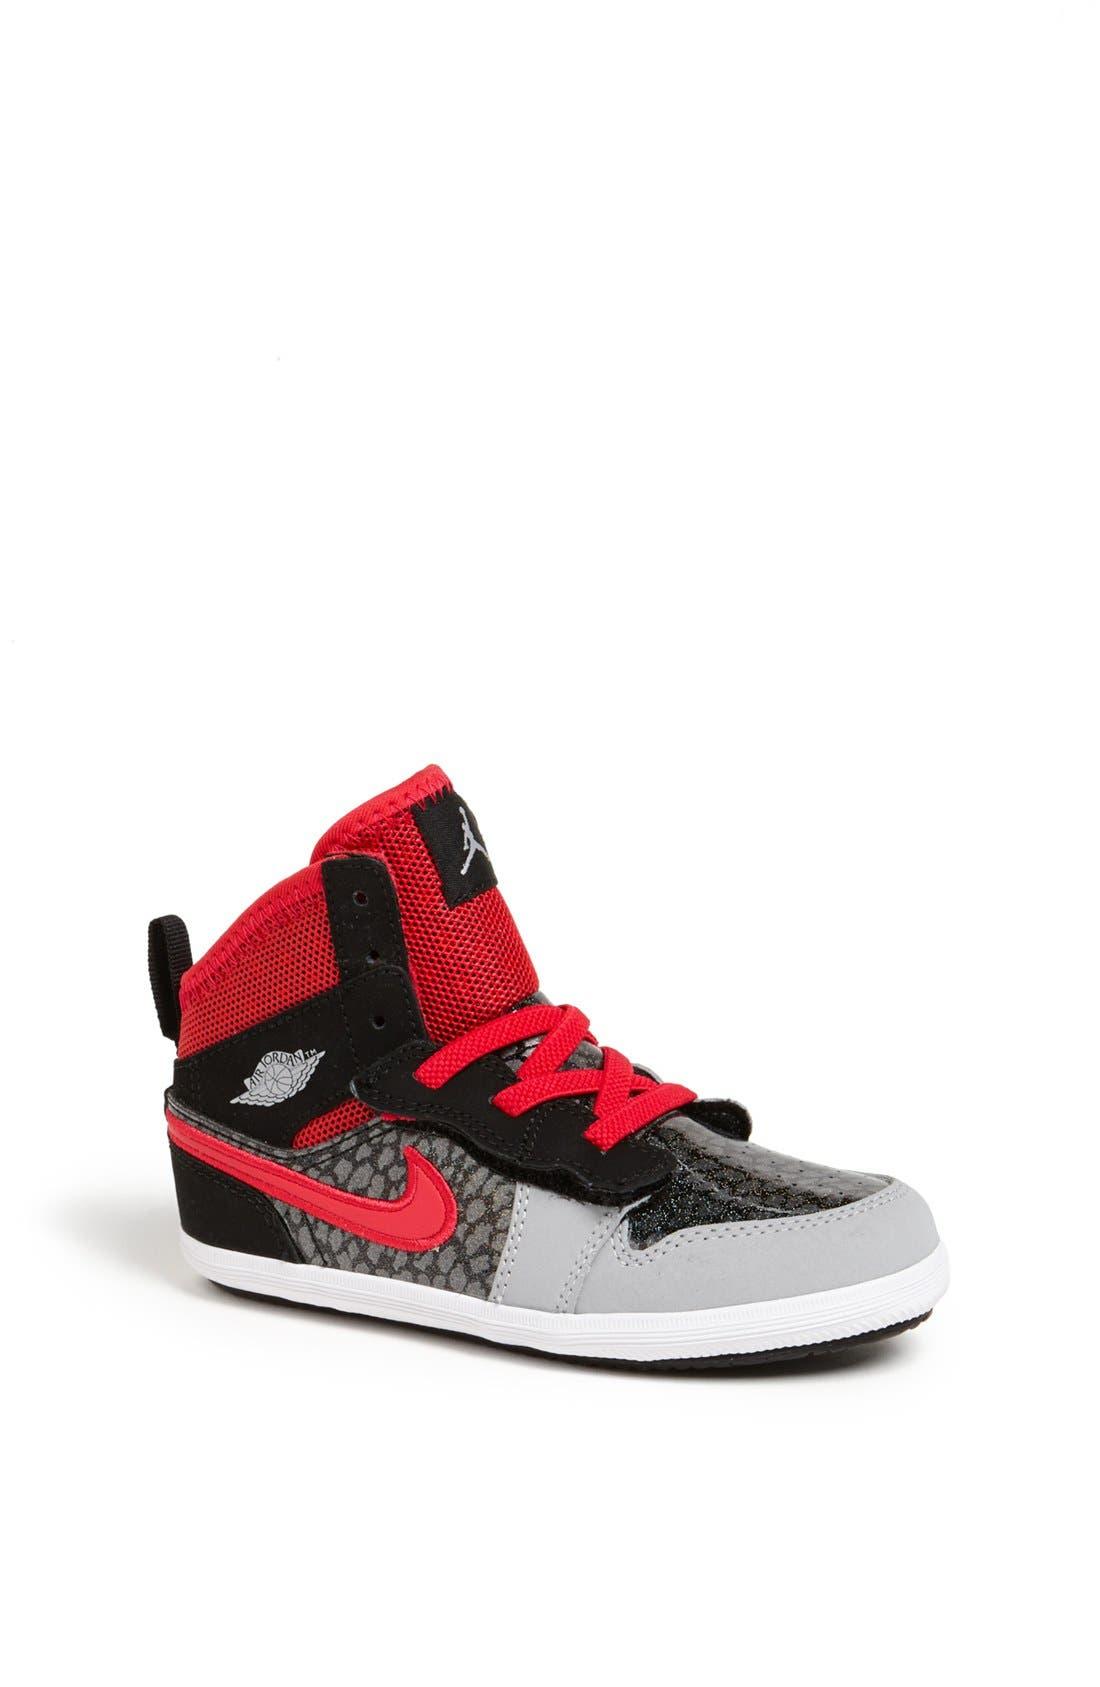 Alternate Image 1 Selected - Nike 'Jordan 1 Skinny High' Sneaker (Baby, Walker & Toddler)